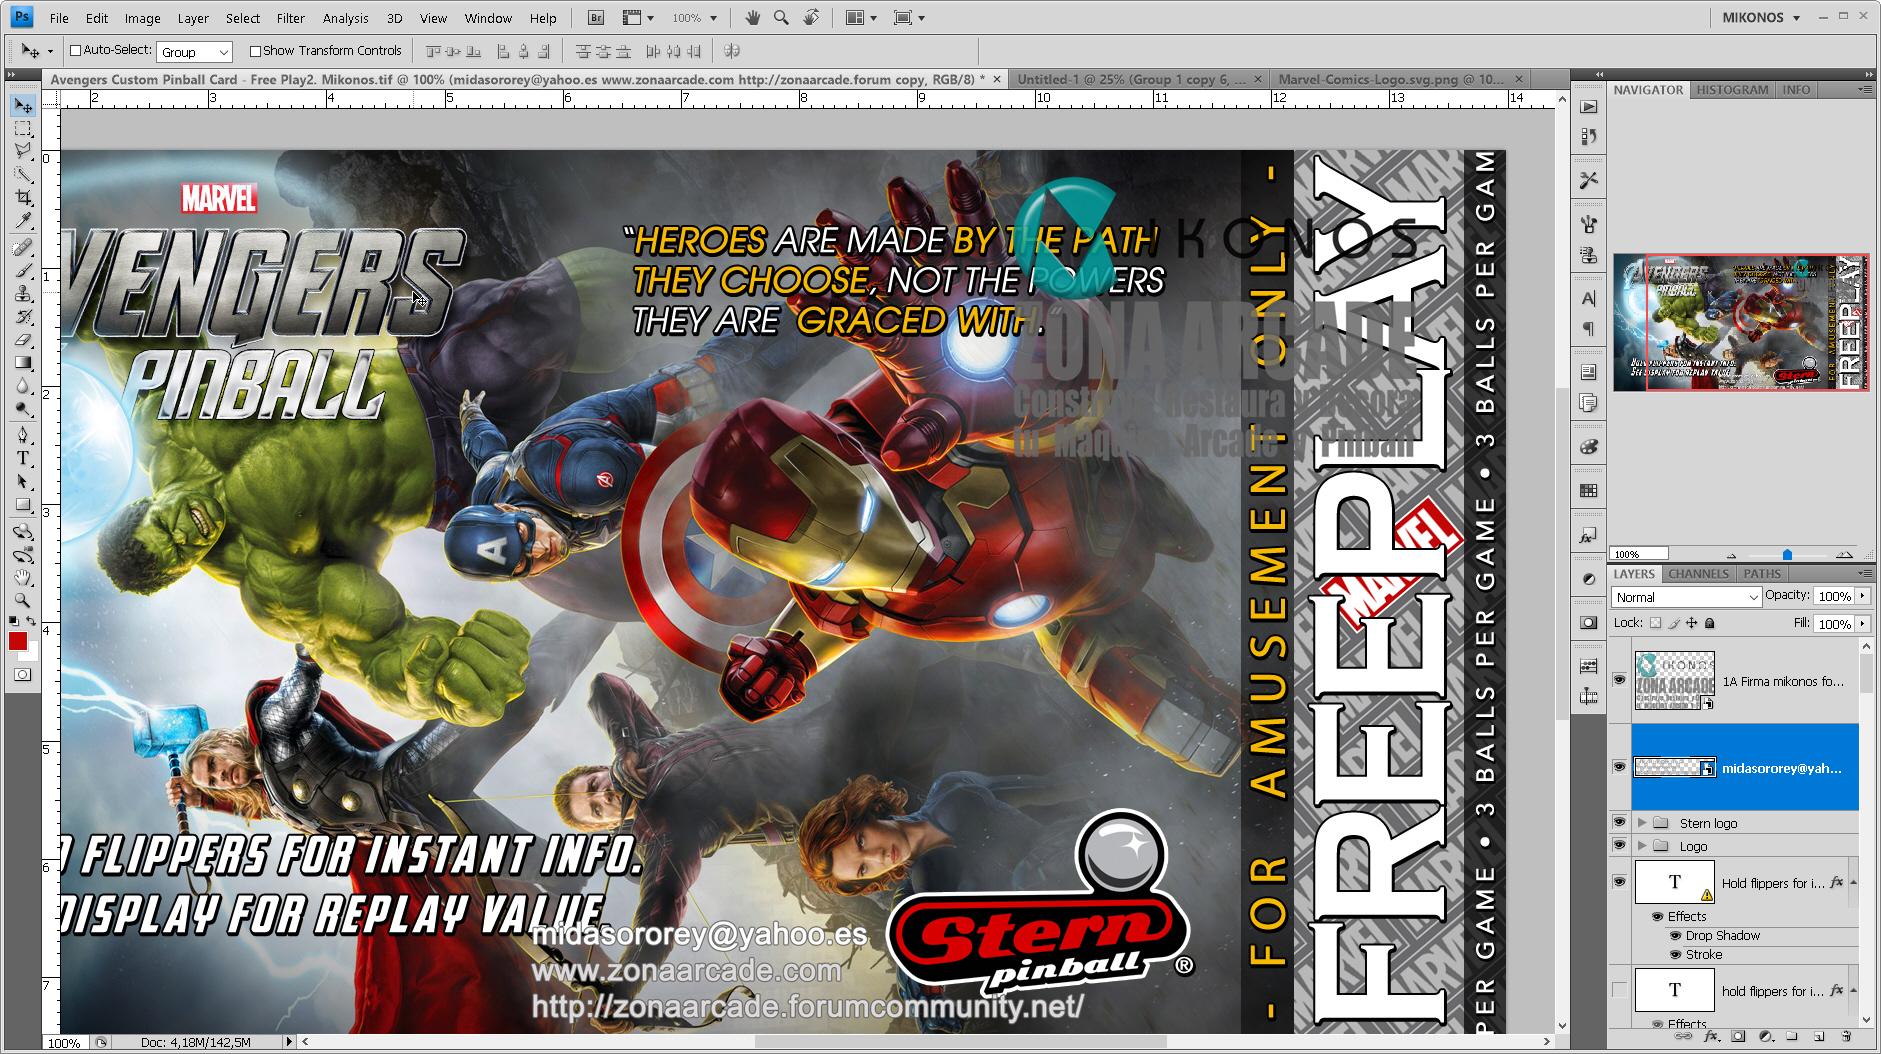 The Avengers Custom Pinball Card - Free Play.%20Mikonos2